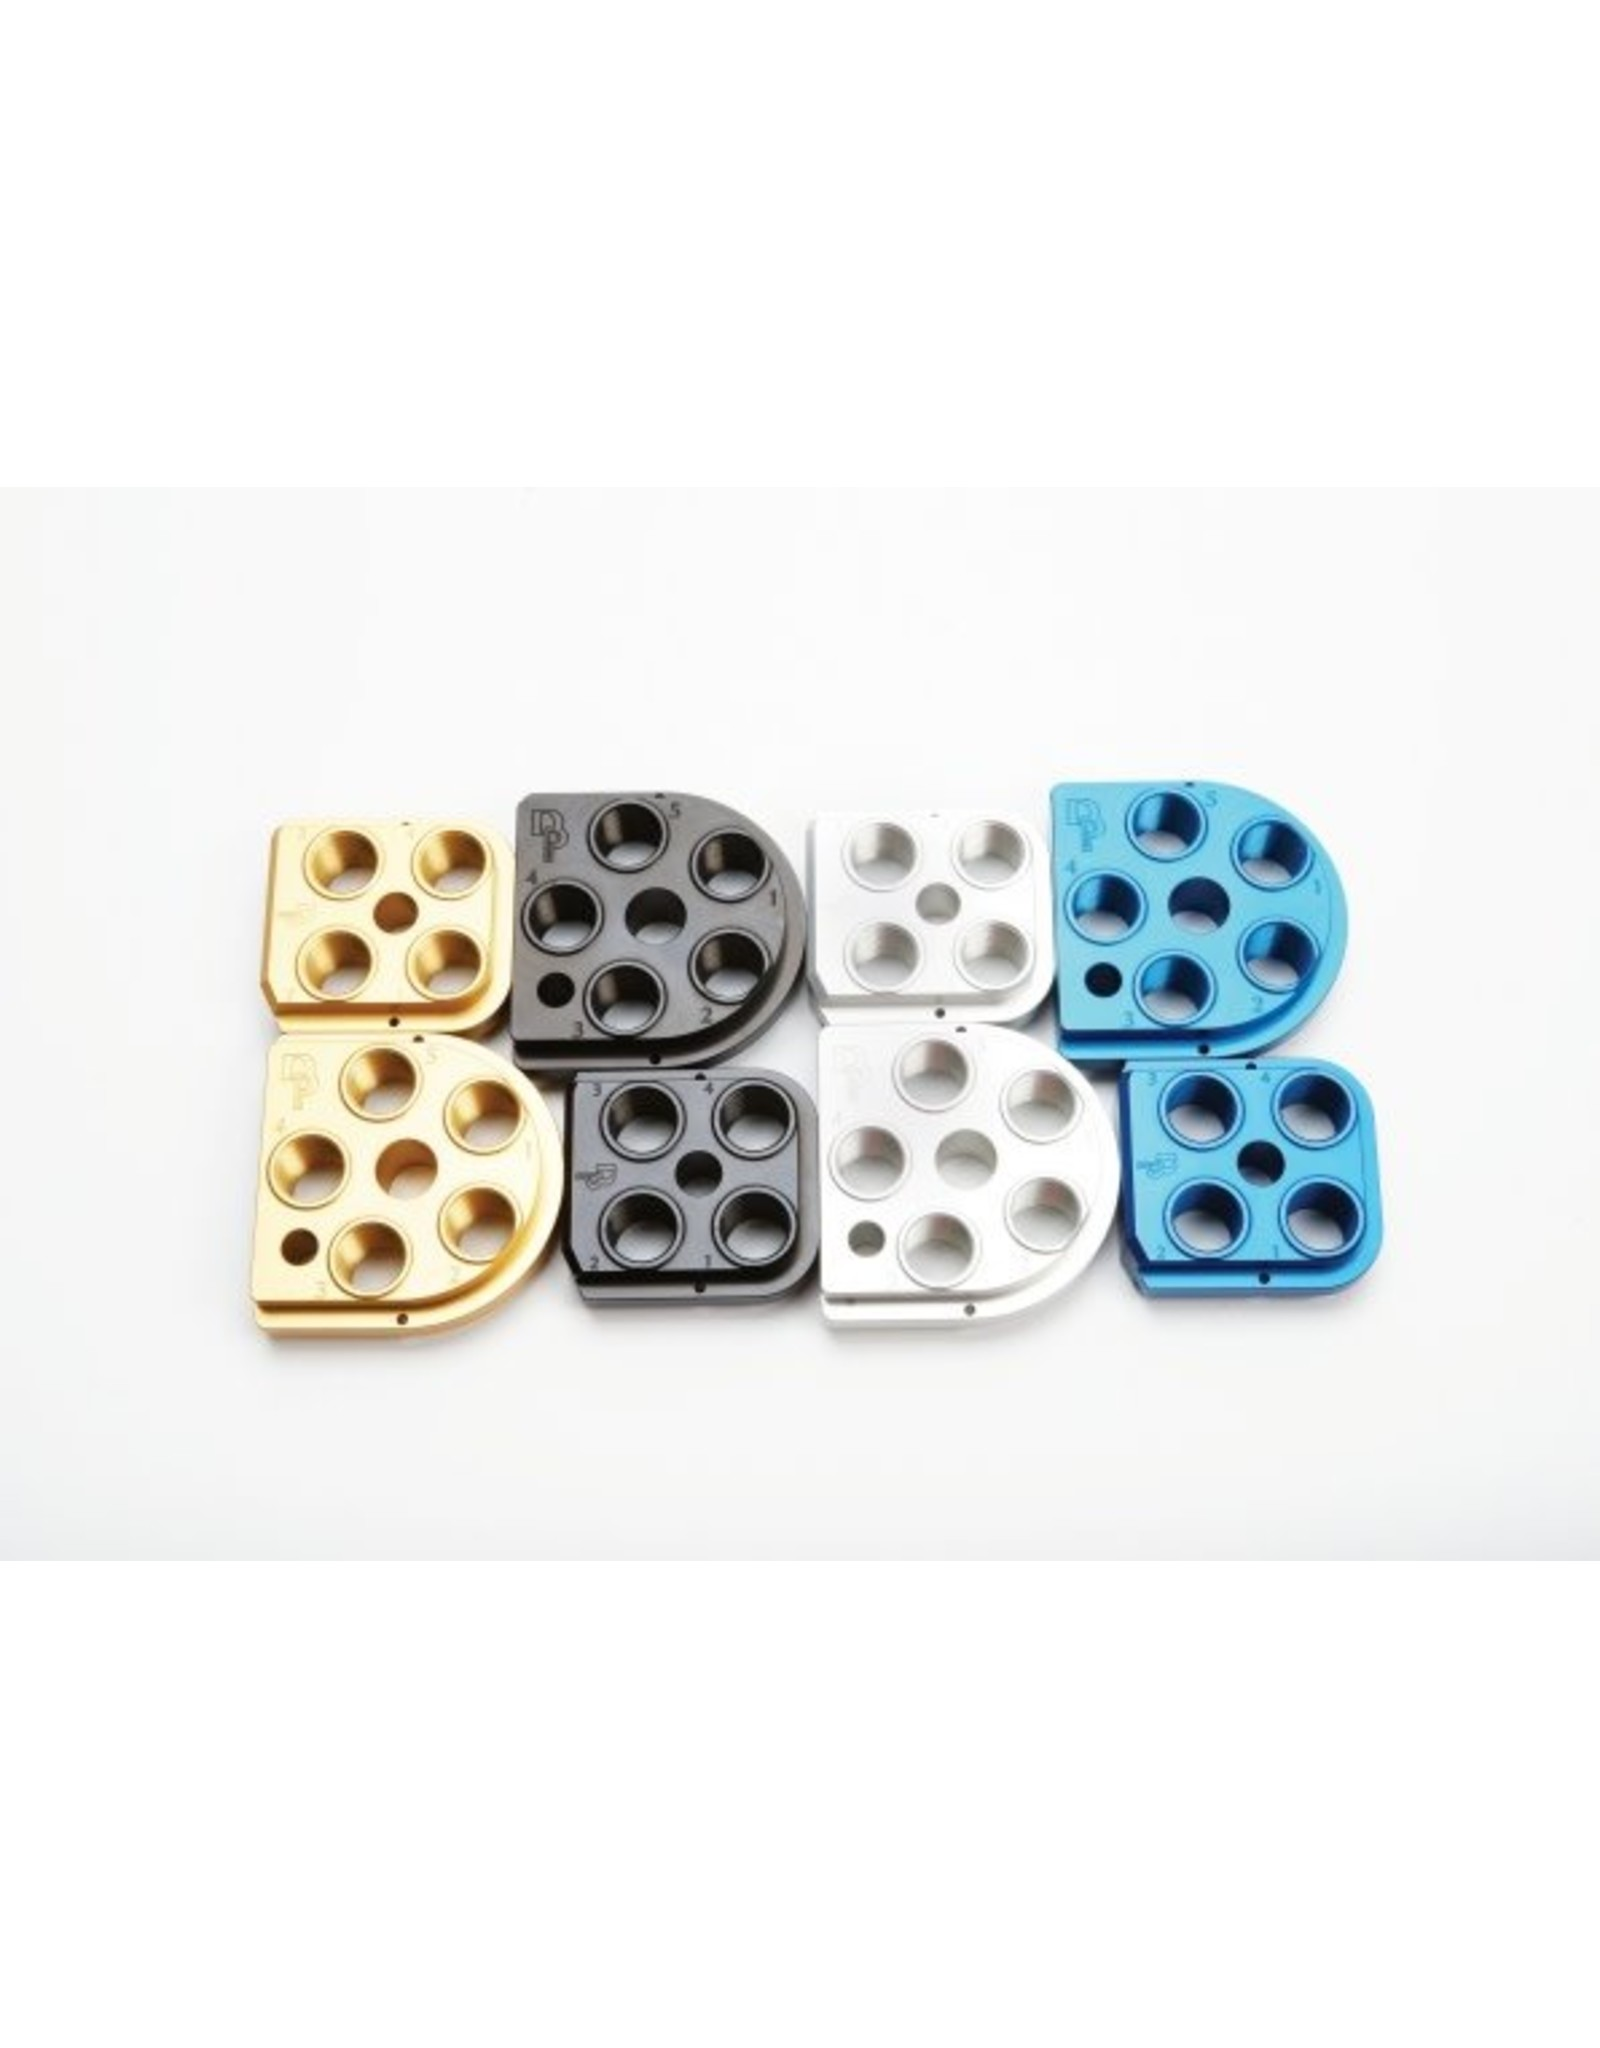 Dillon Precision Dillon XL650/XL750 Billet Aluminum Anodized Toolhead -